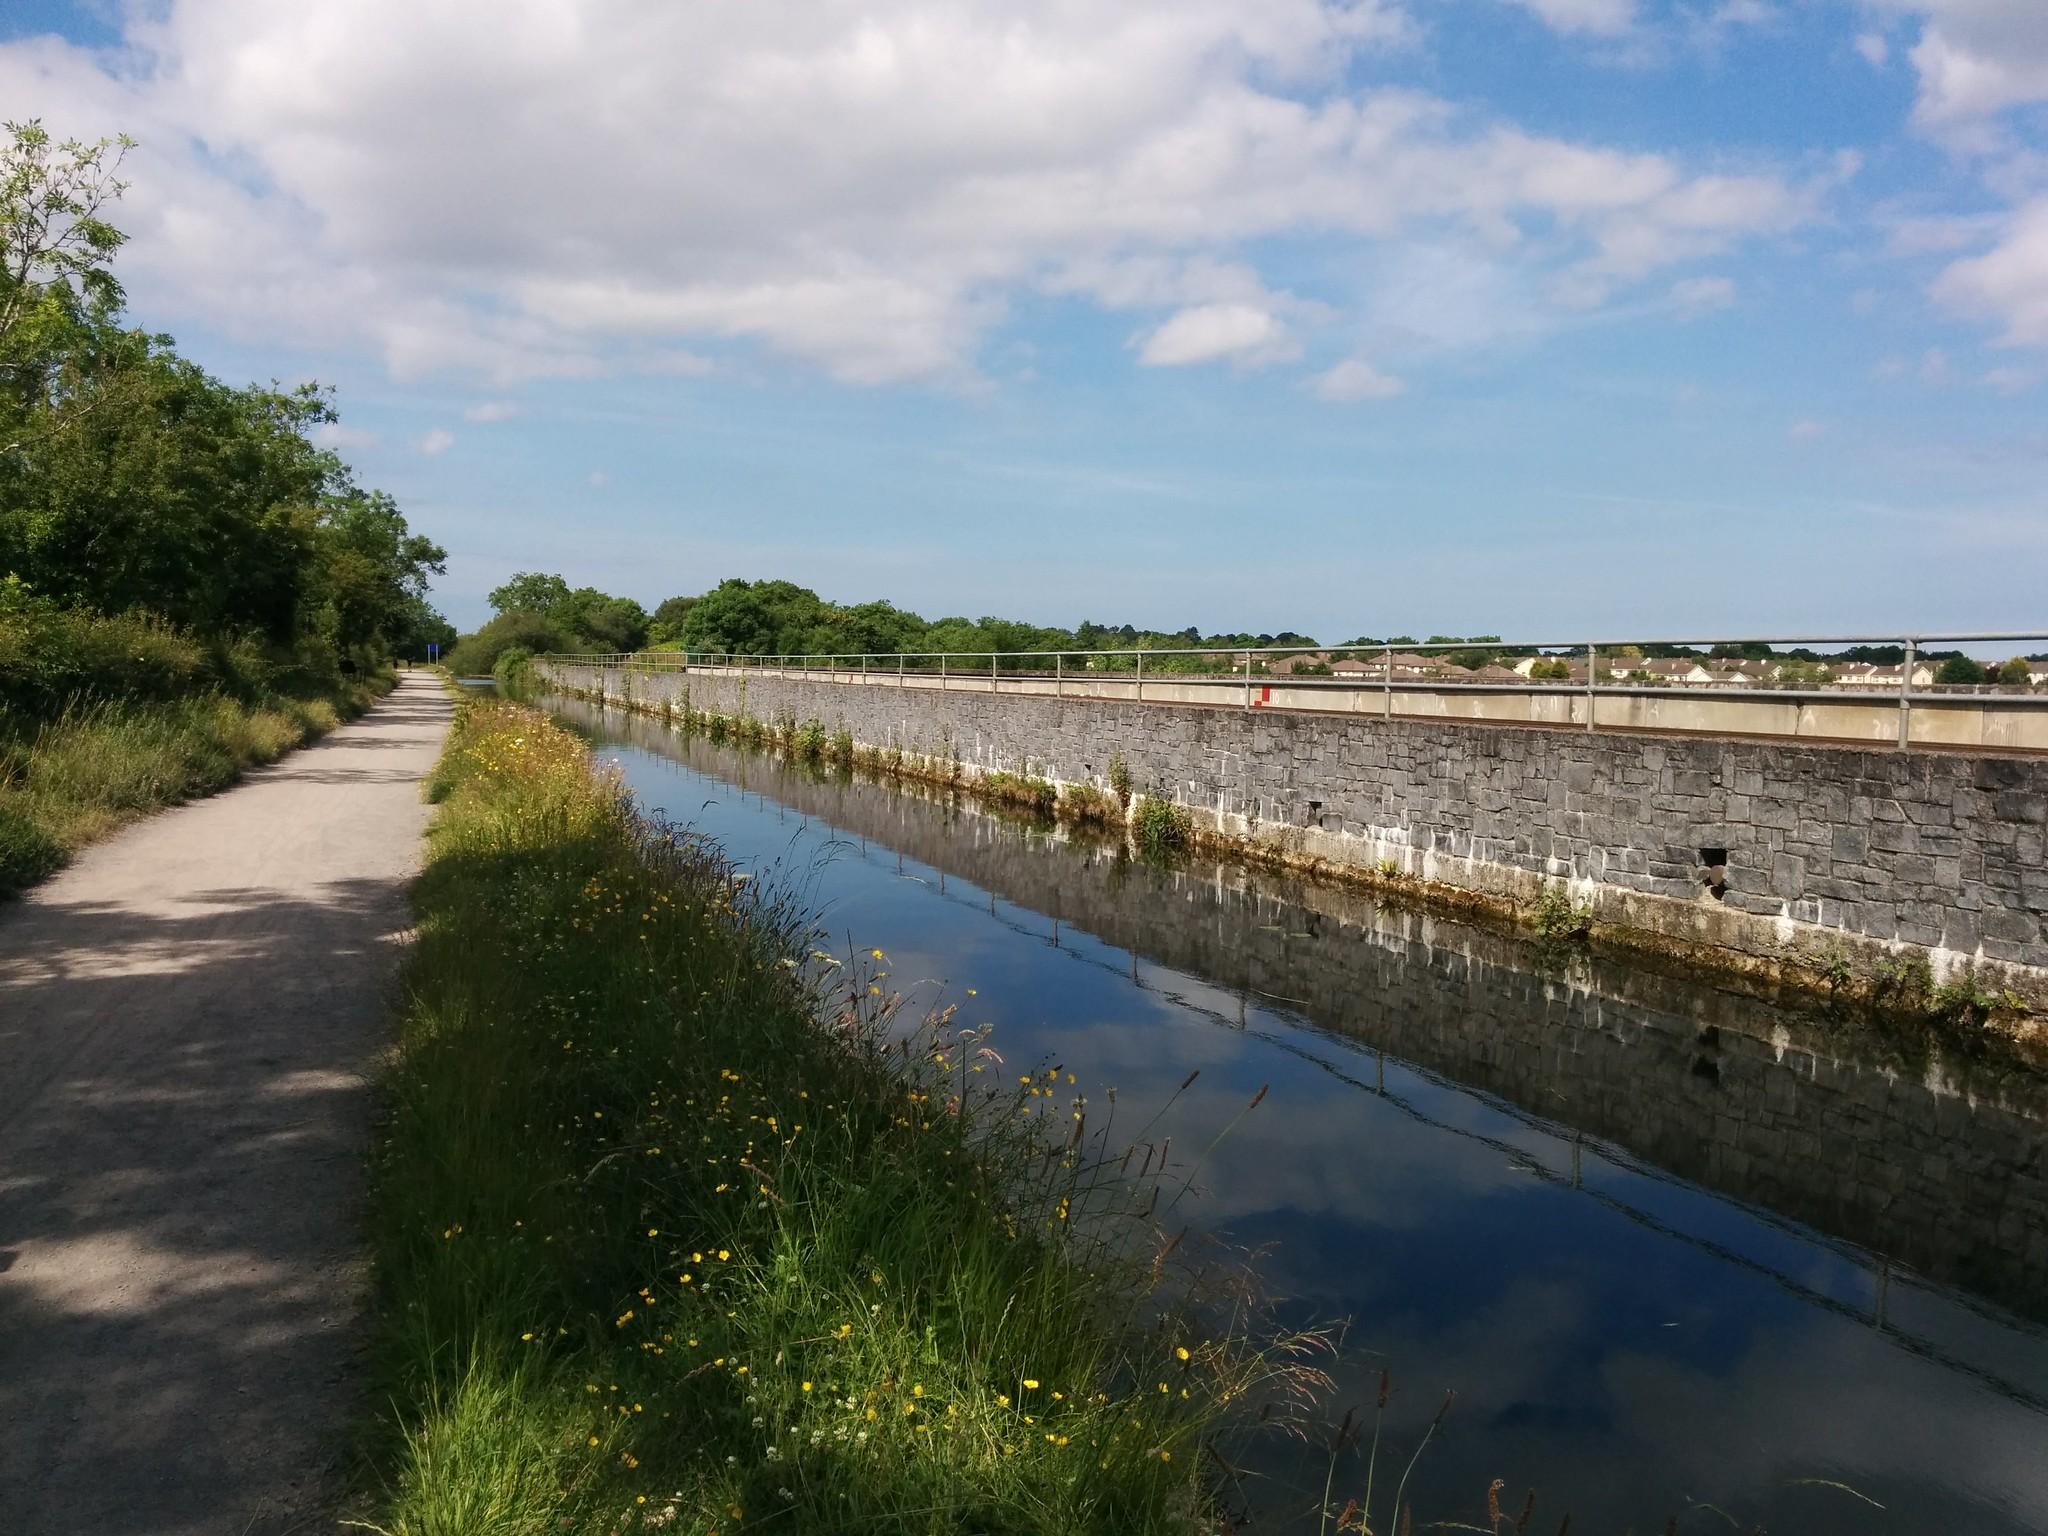 Ryewater Aqueduct